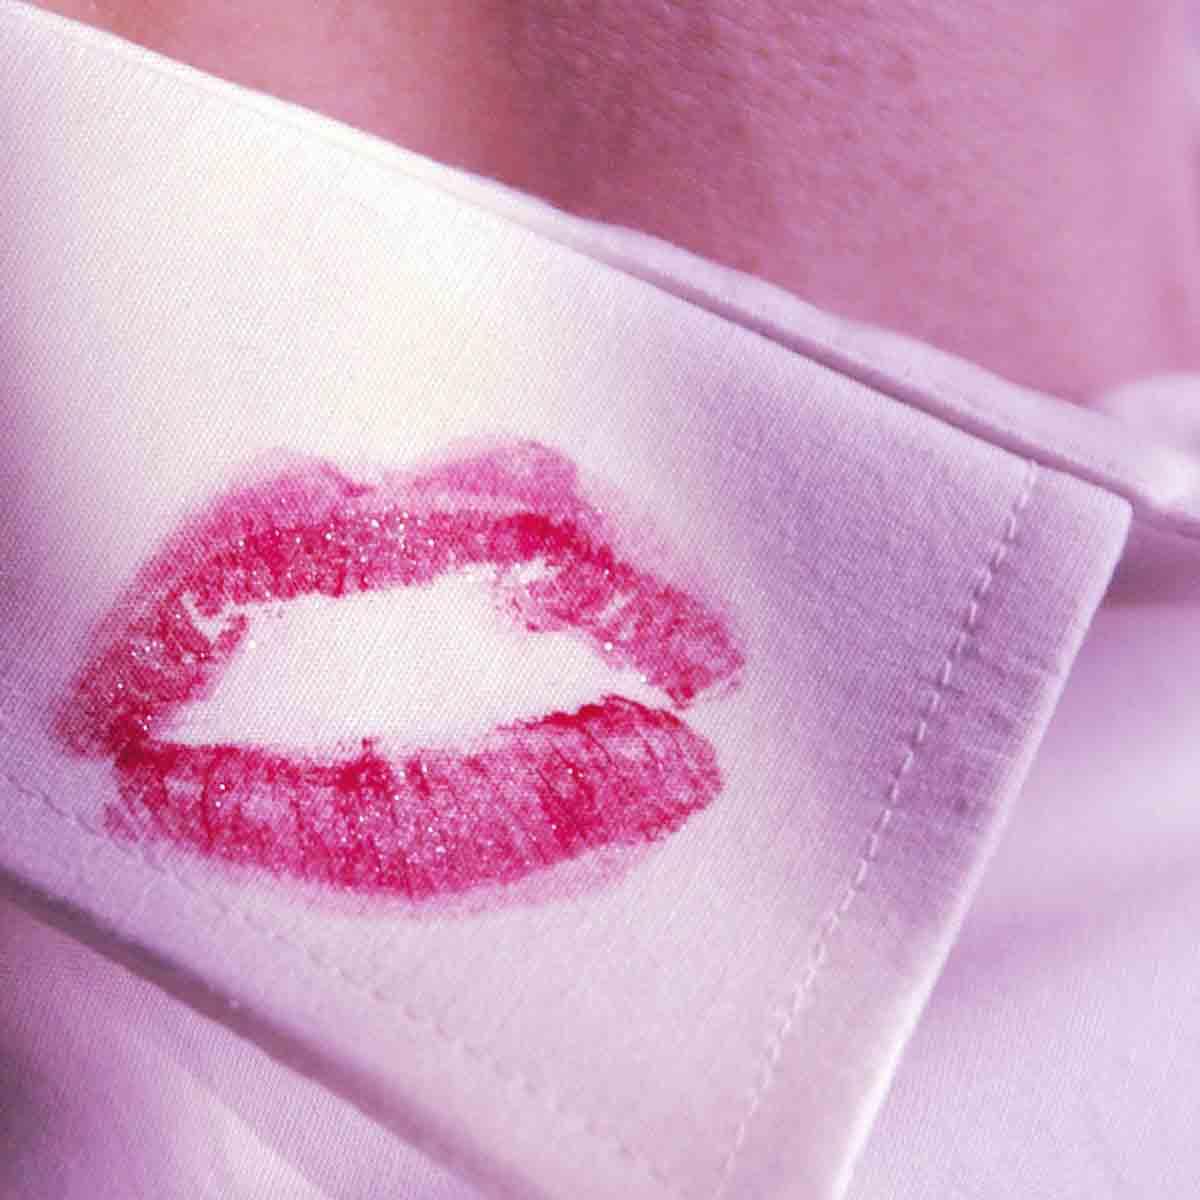 red kiss on mans white shirt collar